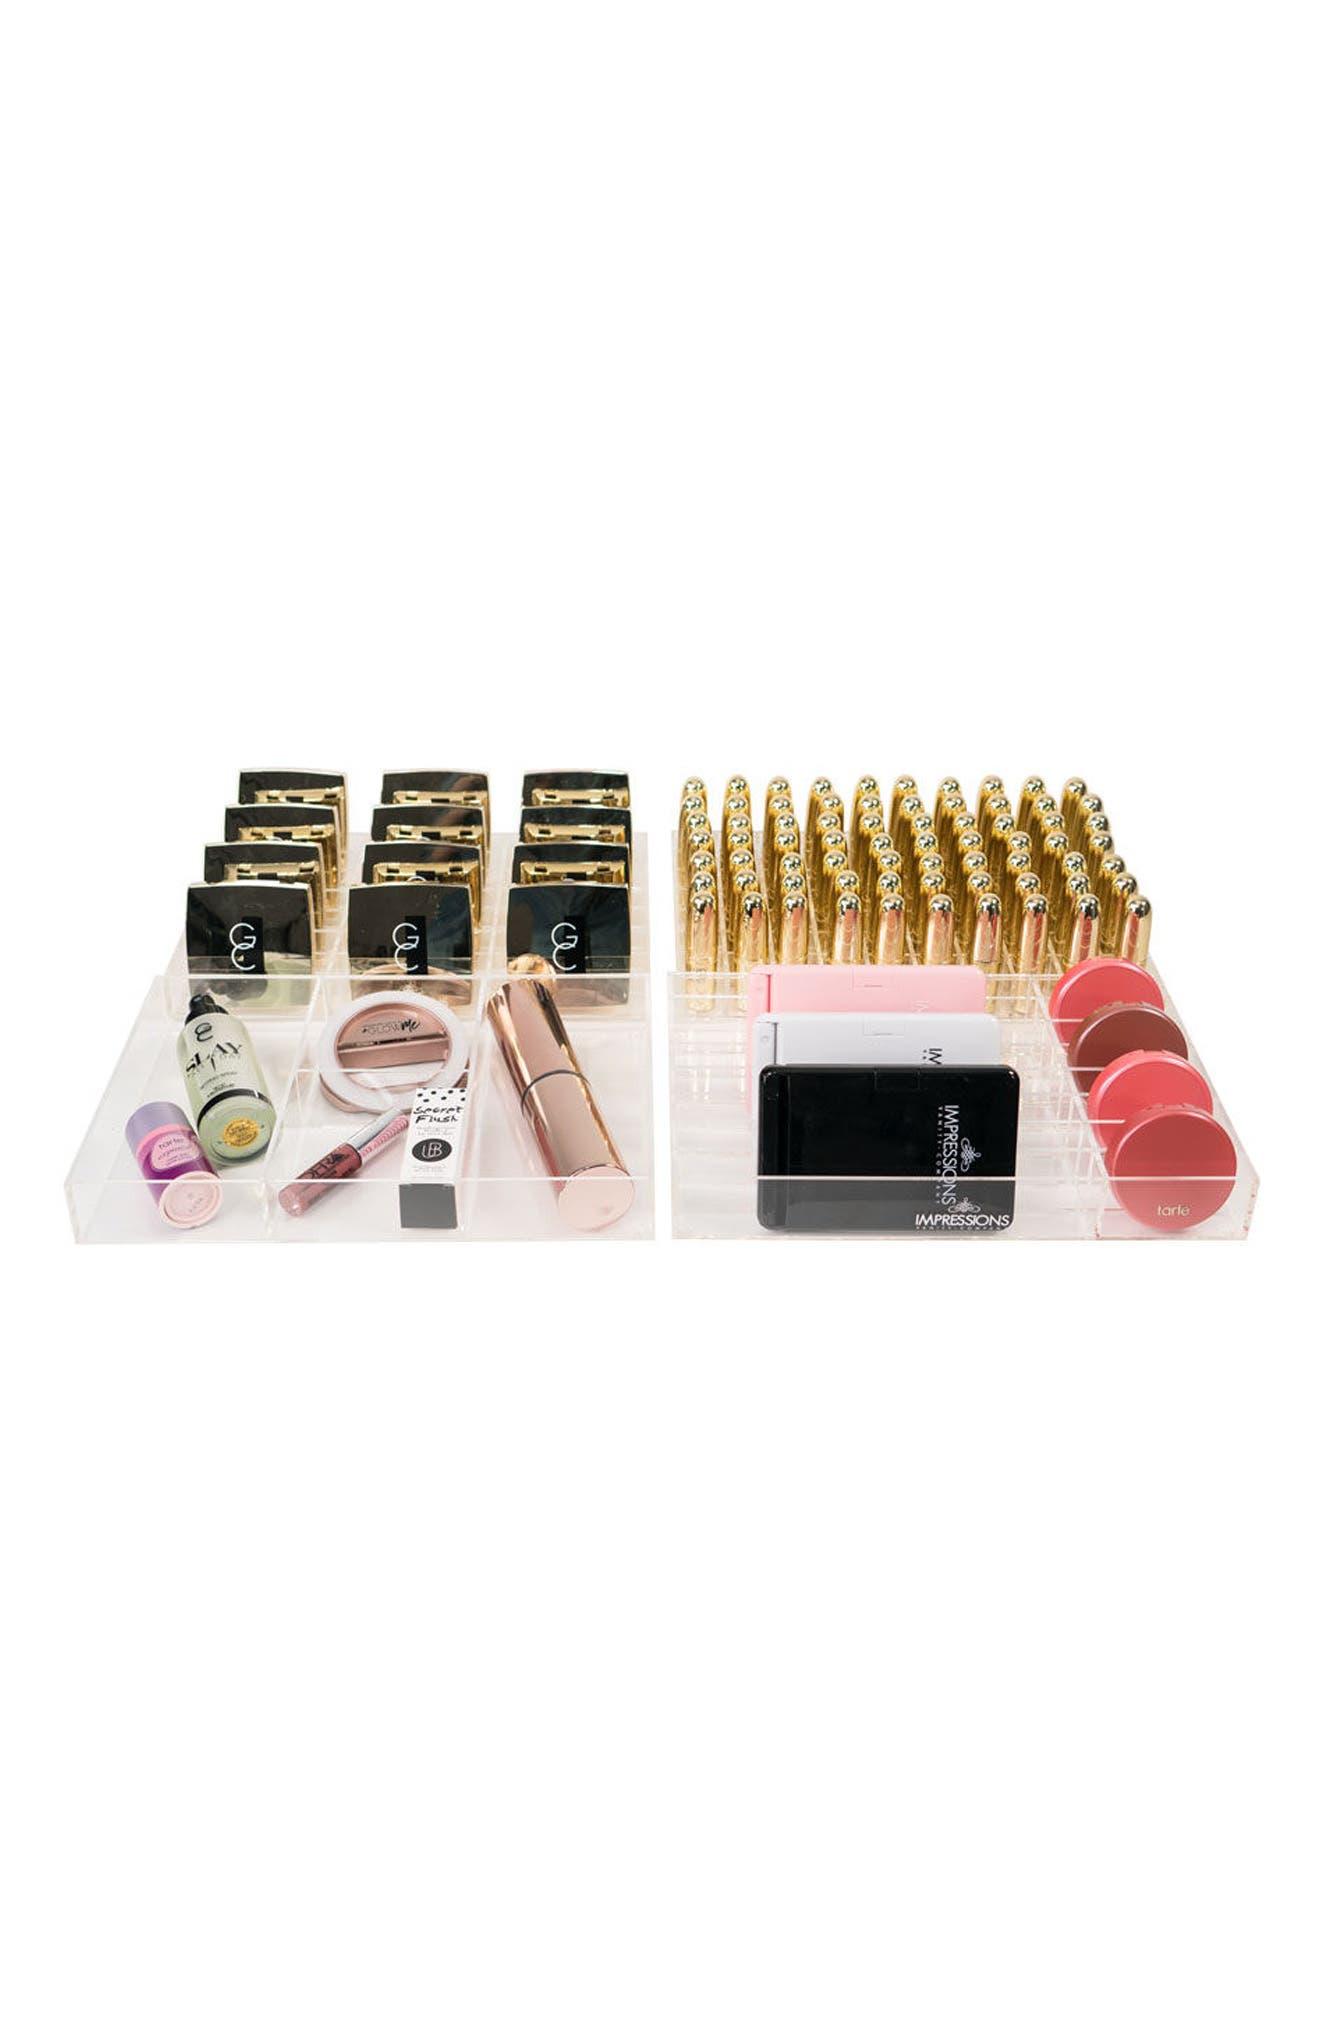 Impressions Vanity Co. Alexa 4-Piece Organizer Set